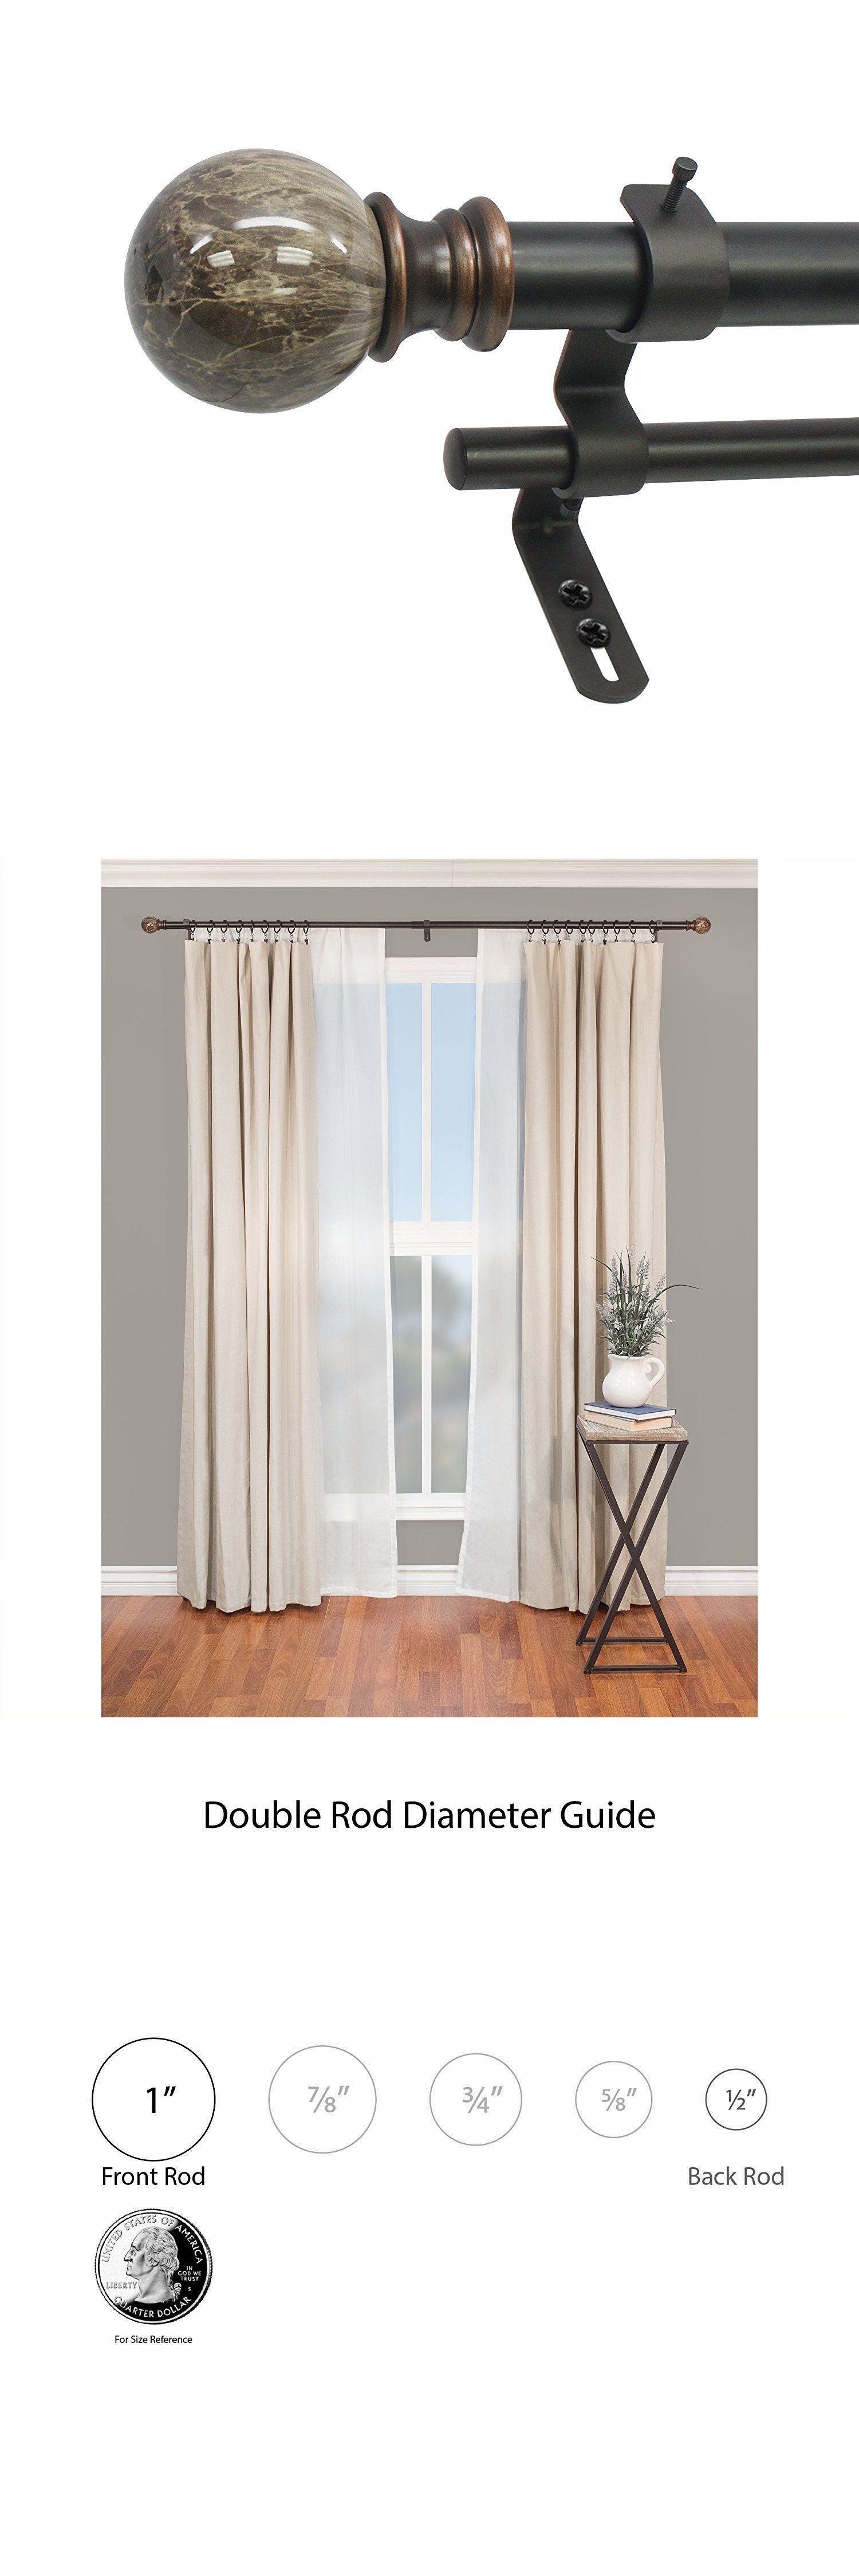 Curtain Rods And Finials 103459 Decopolitan Beme Int 1 Core